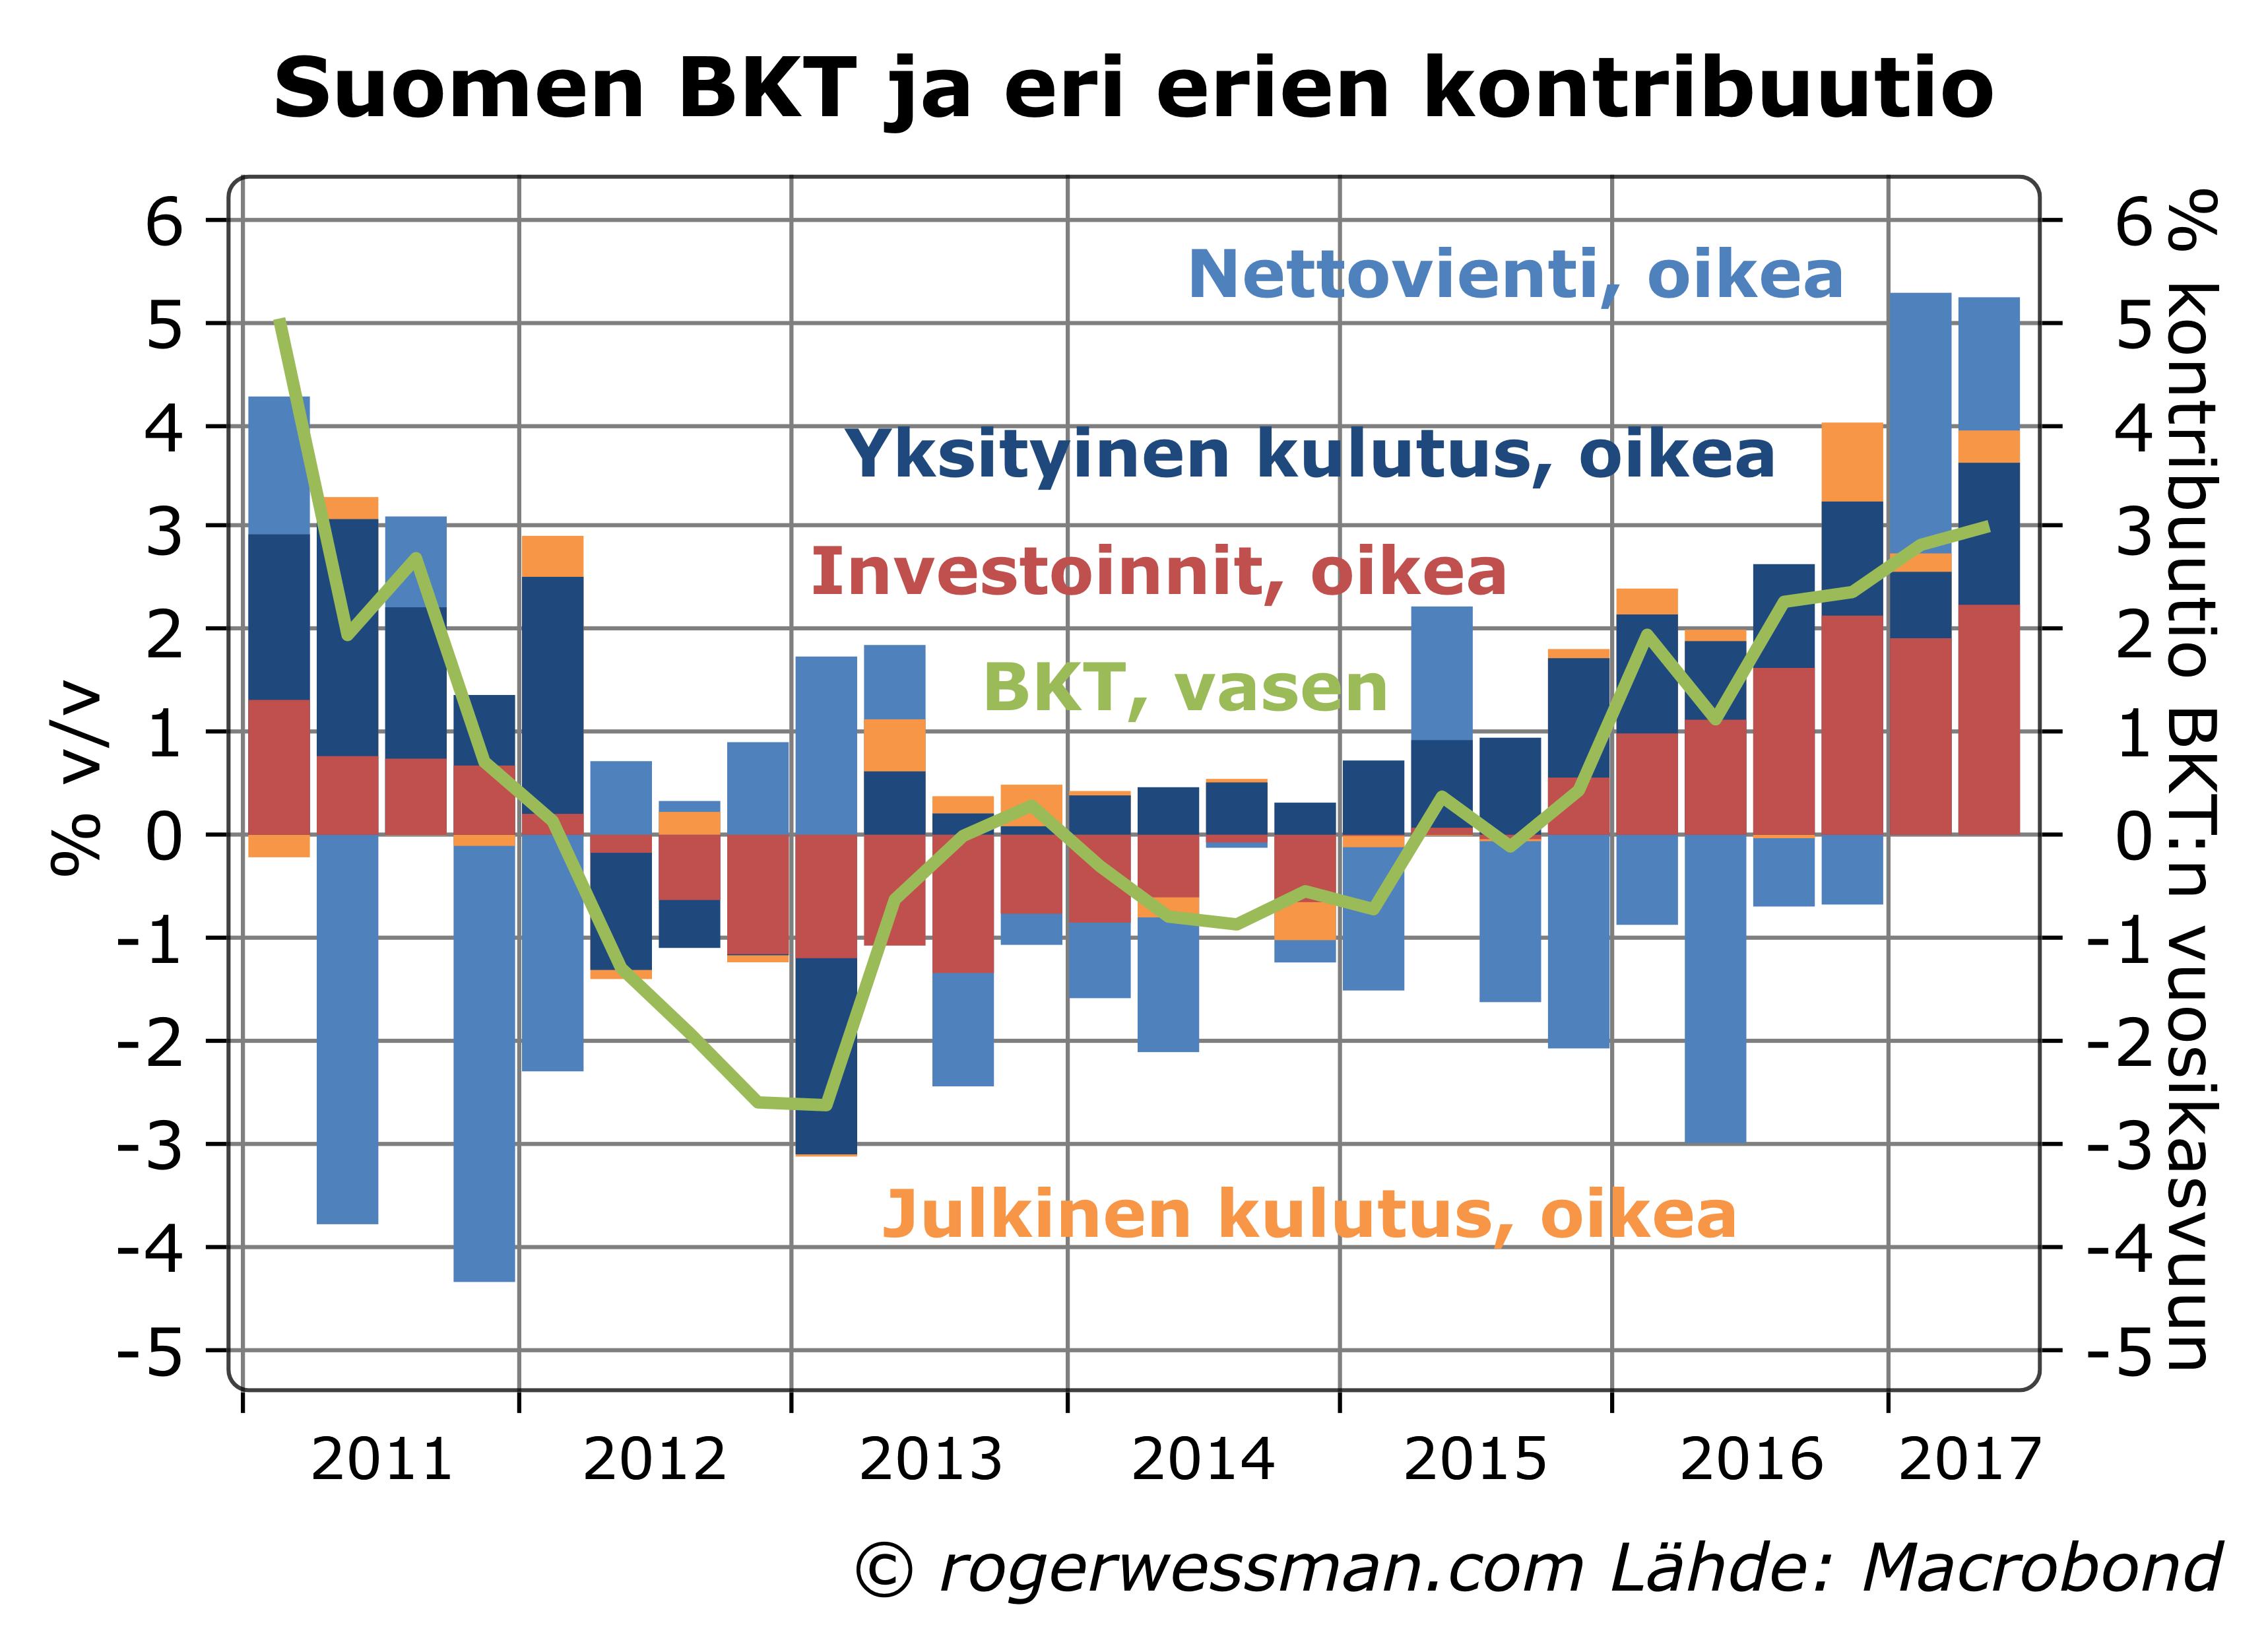 Suomen BKT ja eri erien kontribuutio